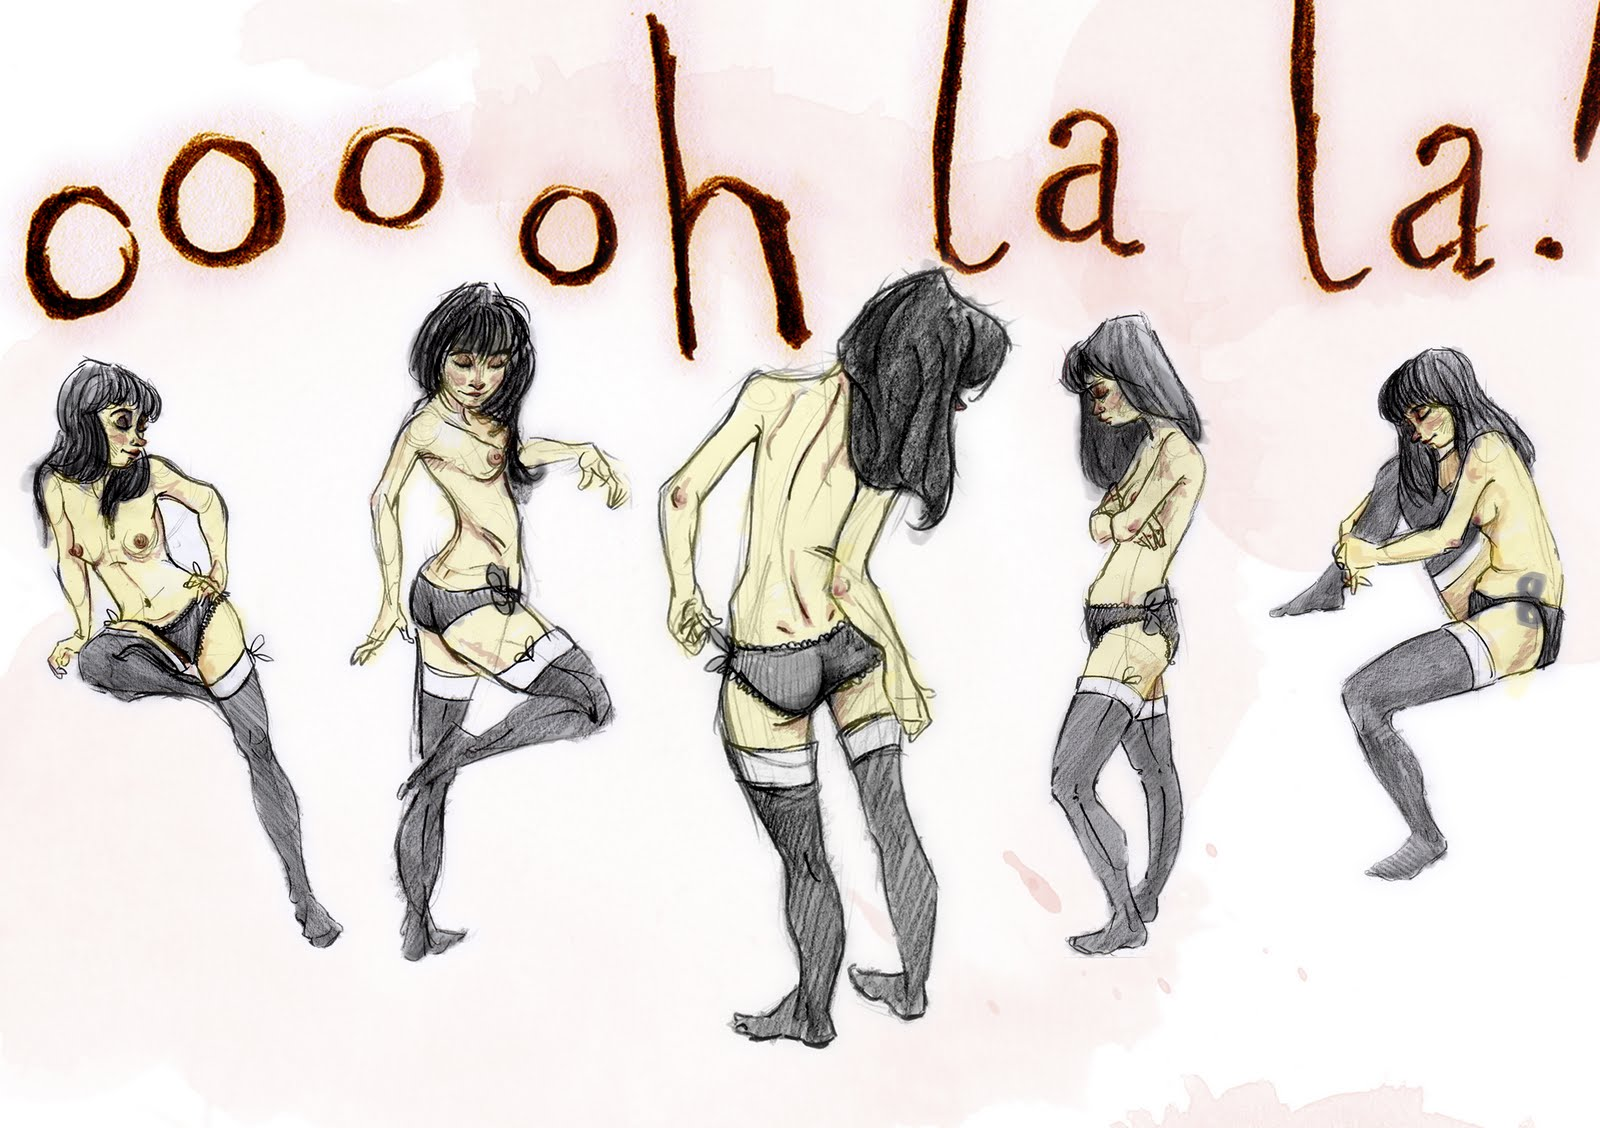 Oooh stacey bradshaw's blog thing: oooh la la!